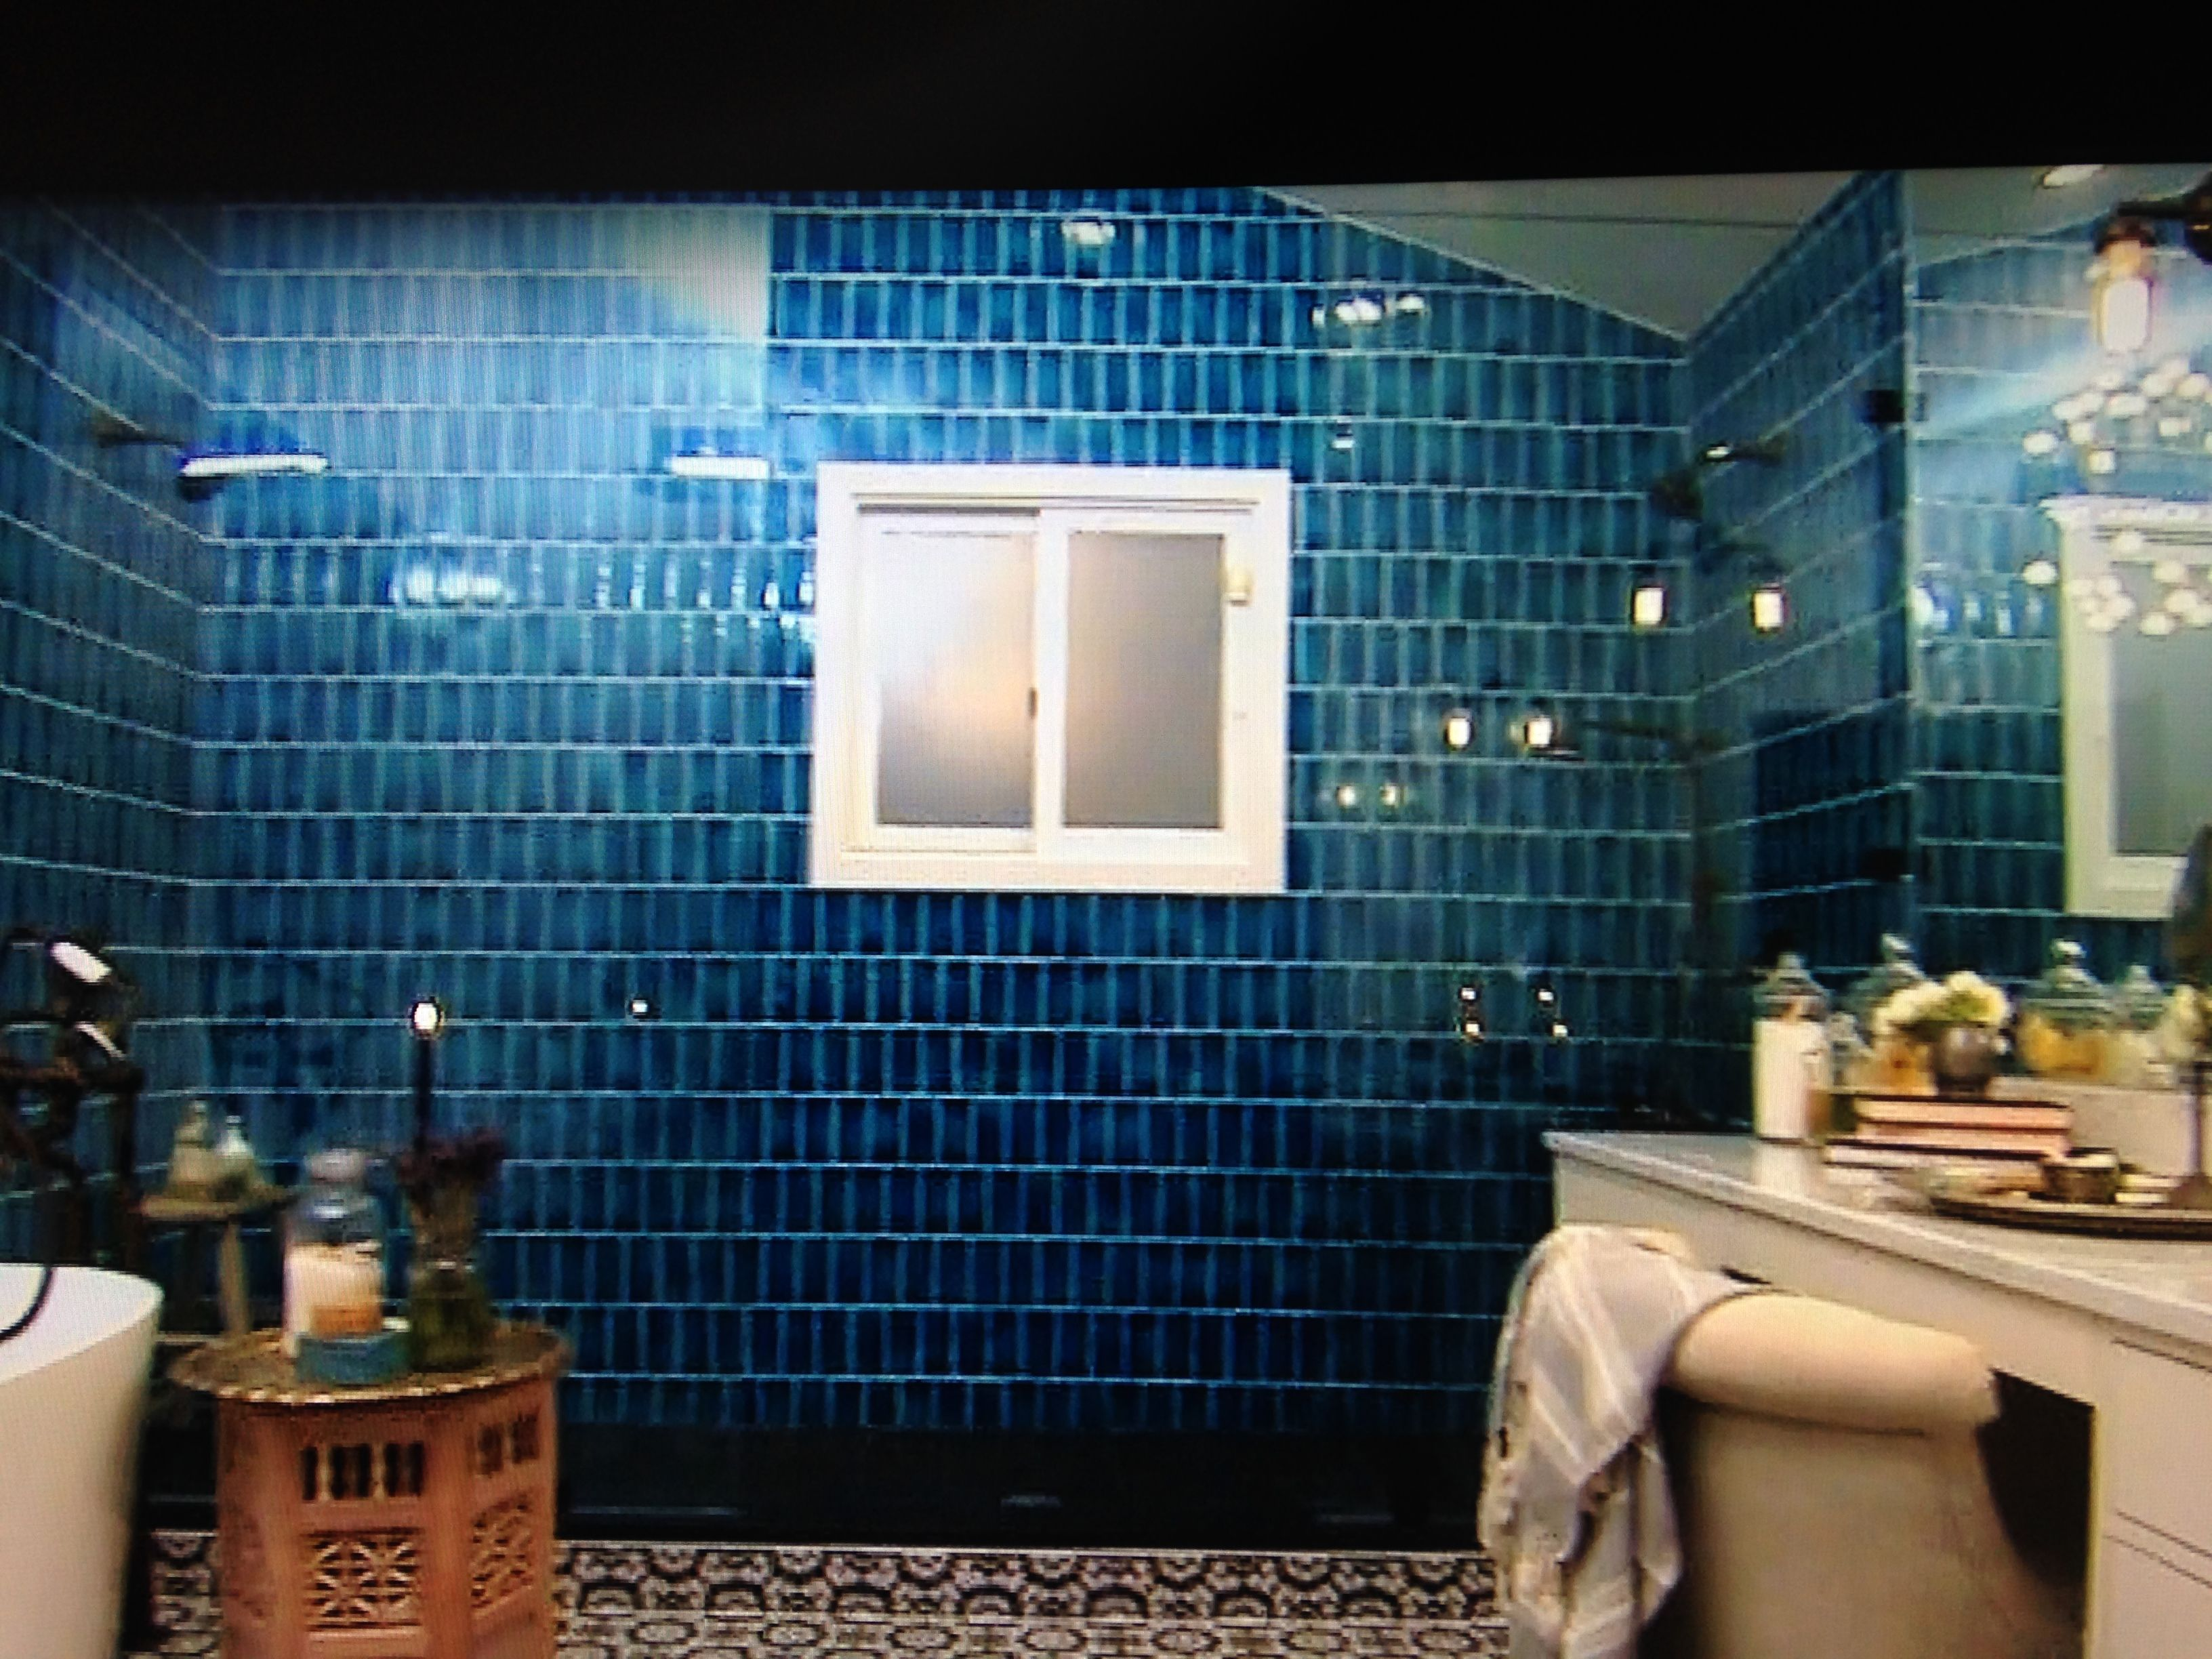 Ocean blue vertical subway tile installed offset perfection ocean blue vertical subway tile installed offset perfection dailygadgetfo Gallery